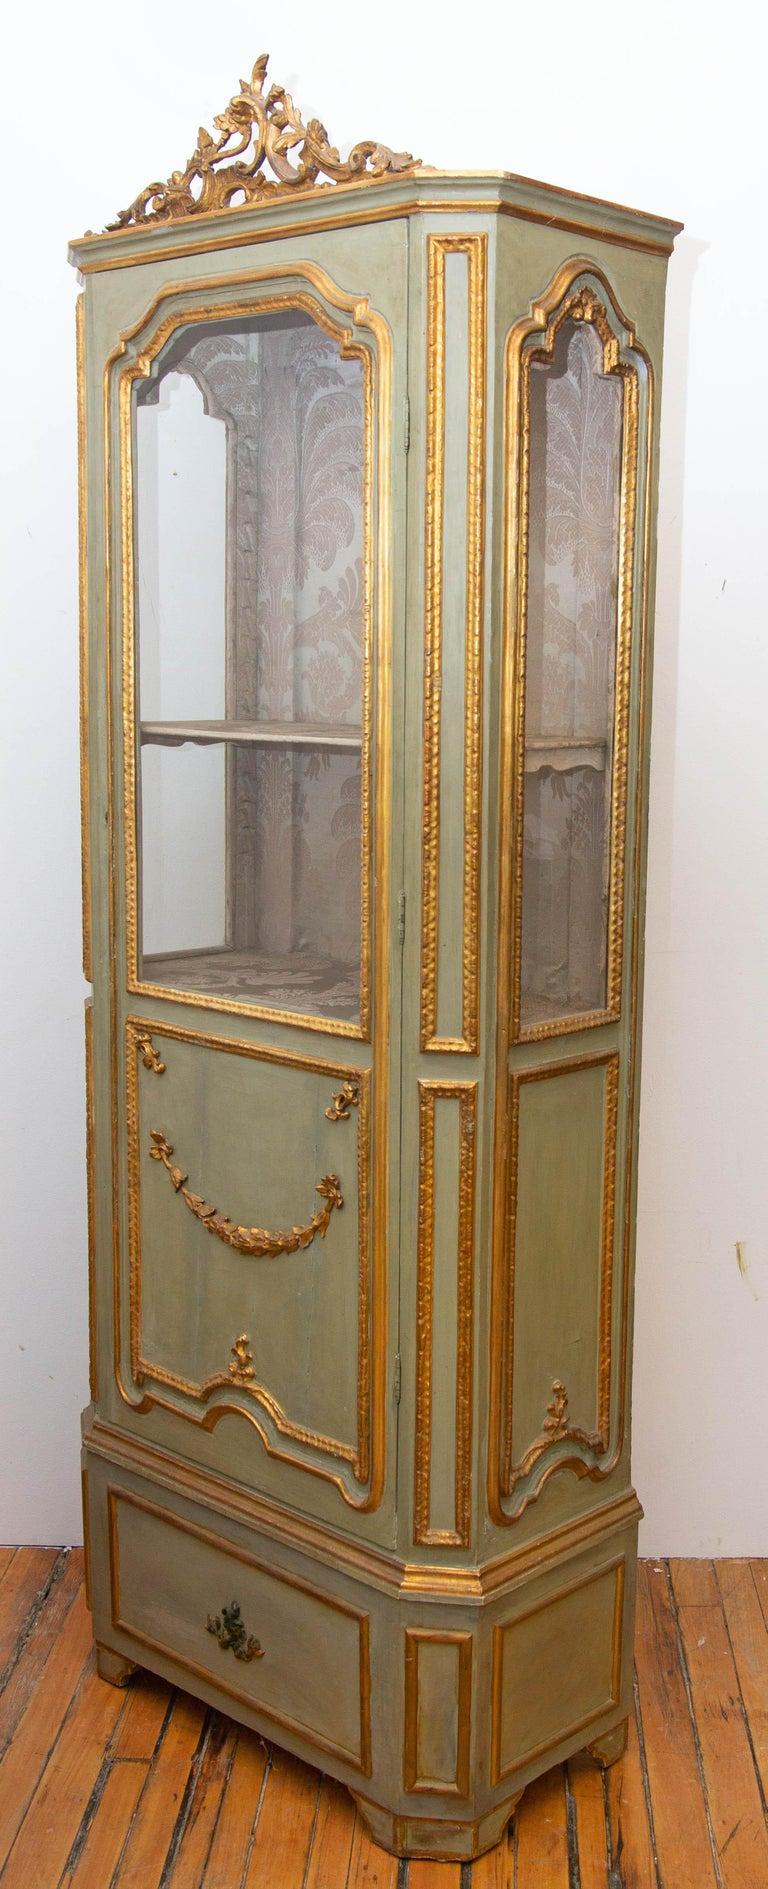 European Italian Louis XVI Painted and Parcel-Gilt Curio Cabinet For Sale